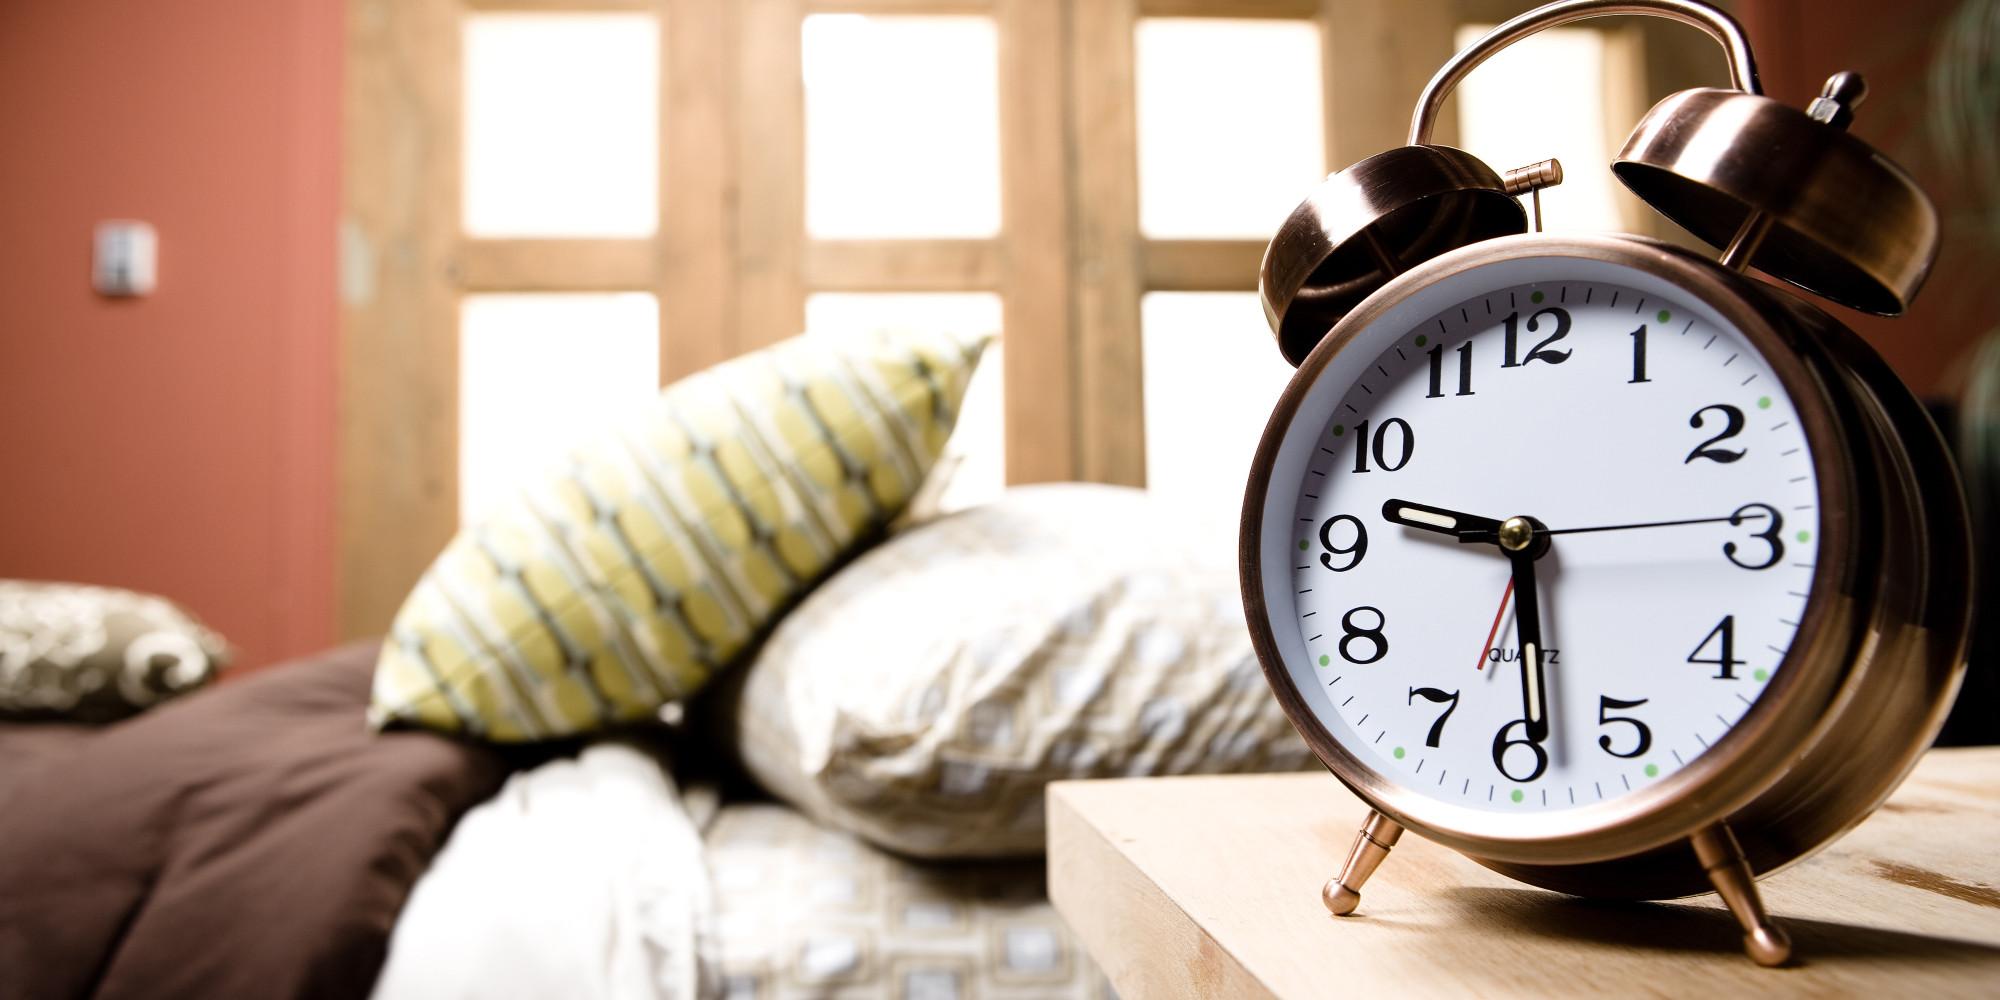 Функция будильника